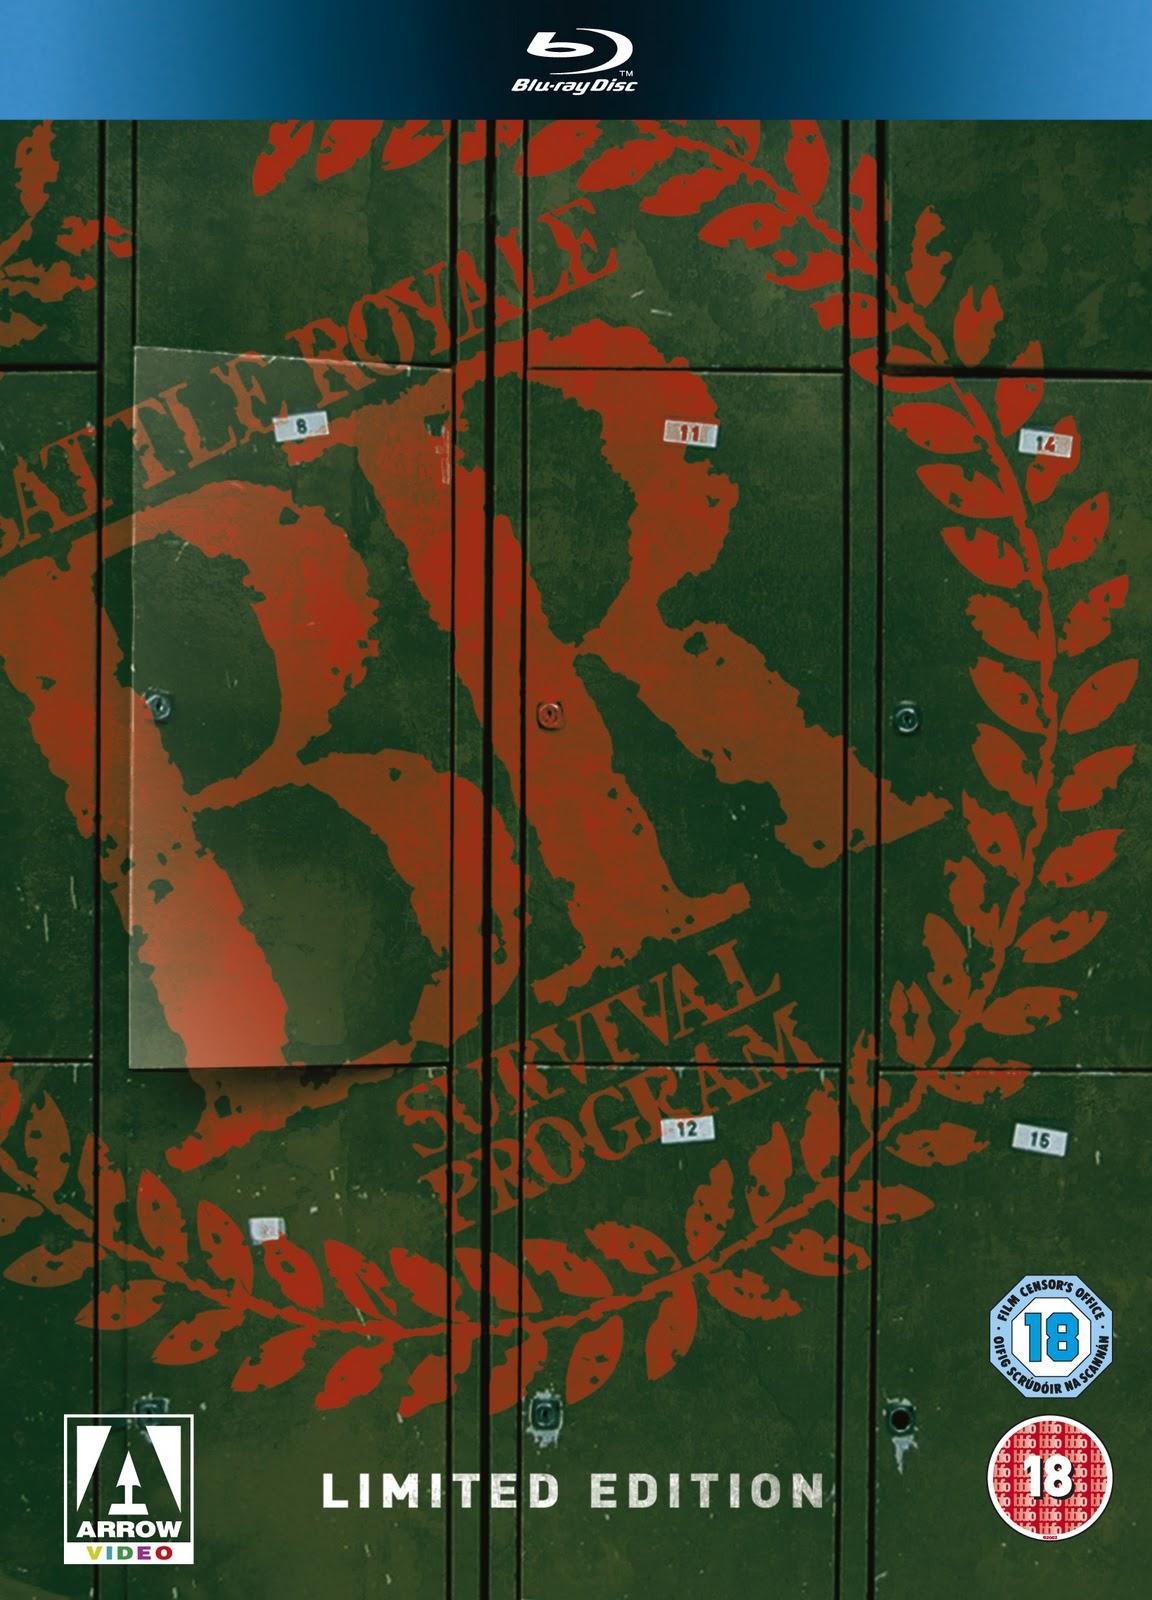 Battle royales [BRRIP|TRUEFRENCH] [DIRECTORS CUT] [AC3] [FS] [US]